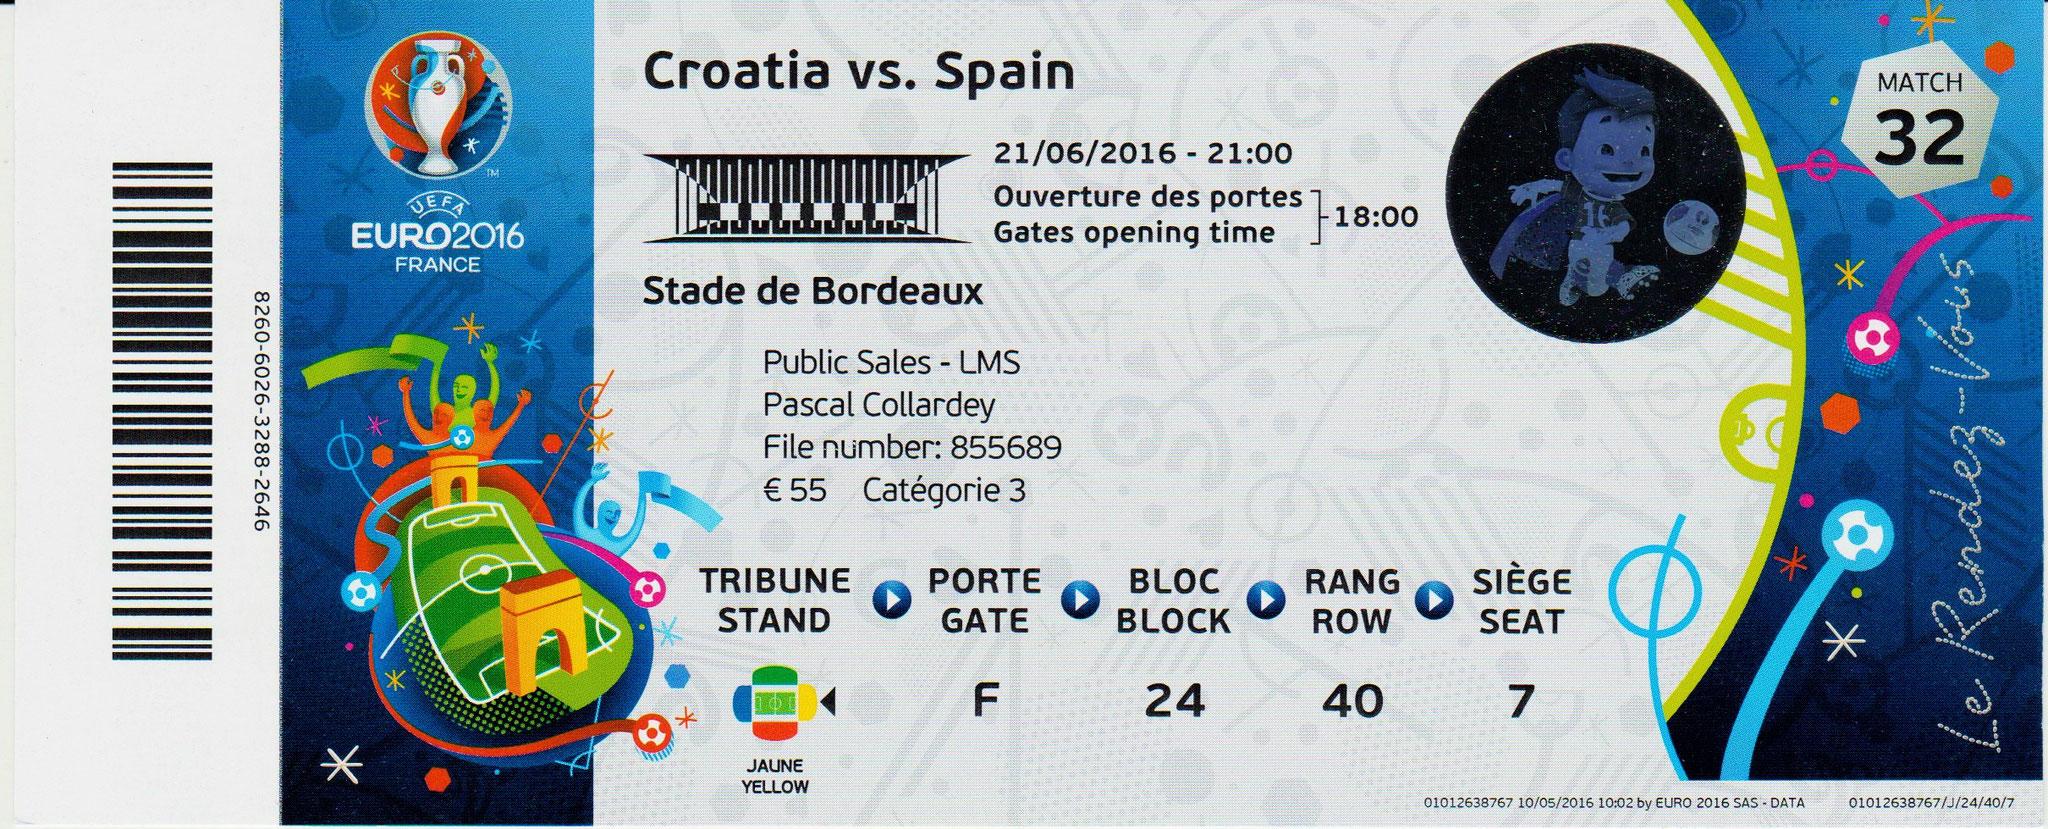 21/06/2016 Bordeaux : Croatie  2 - 1  Espagne  > Morata (Esp) -- Kalinic et Perisic (Cro) <